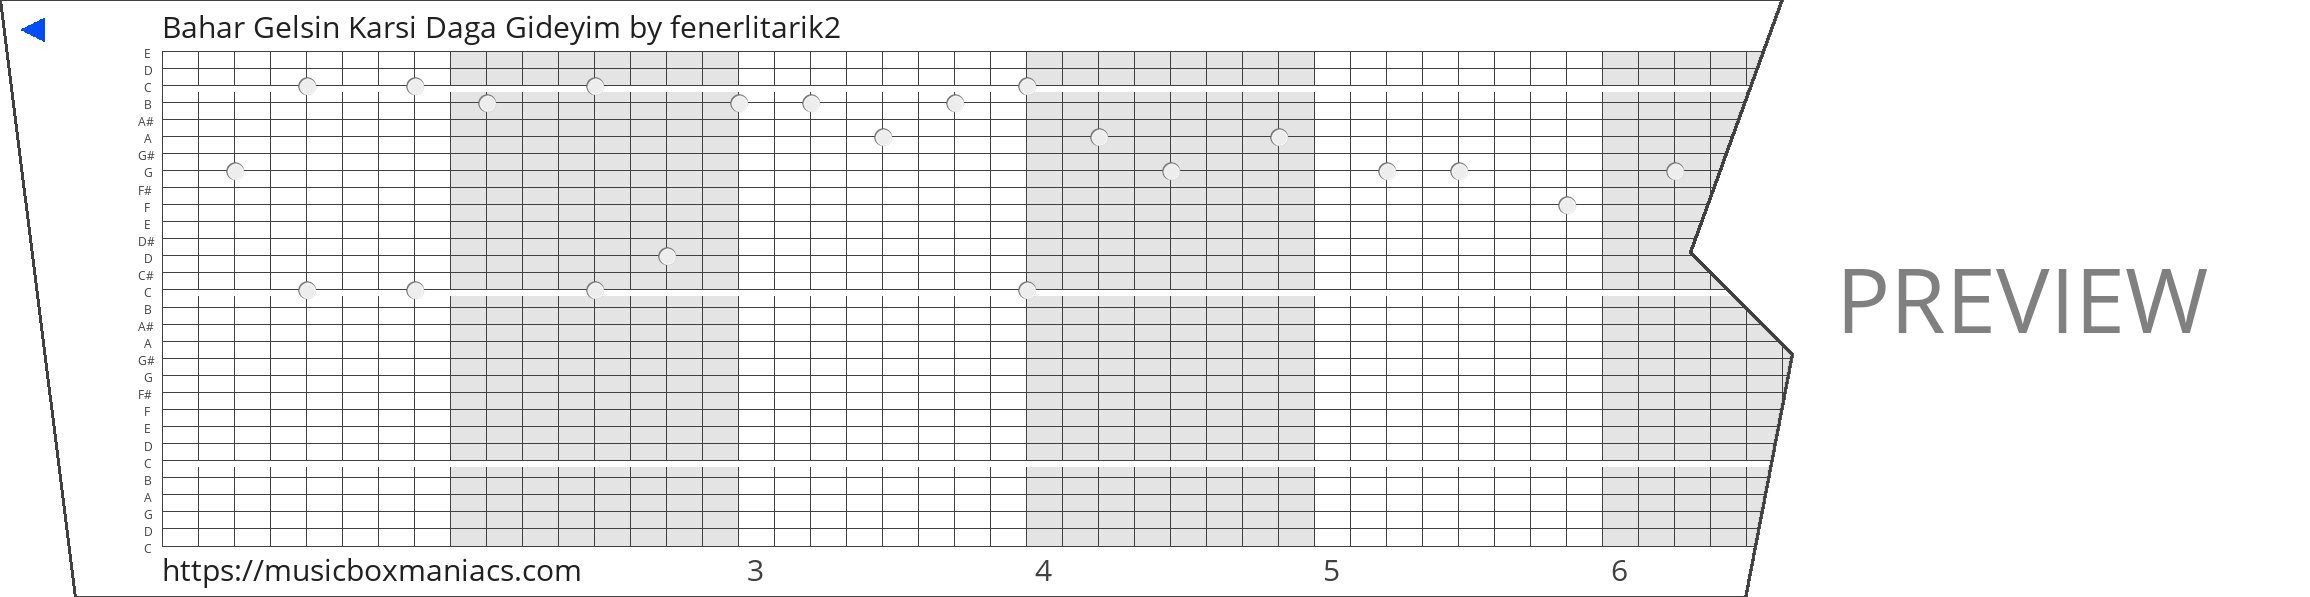 Bahar Gelsin Karsi Daga Gideyim 30 note music box paper strip